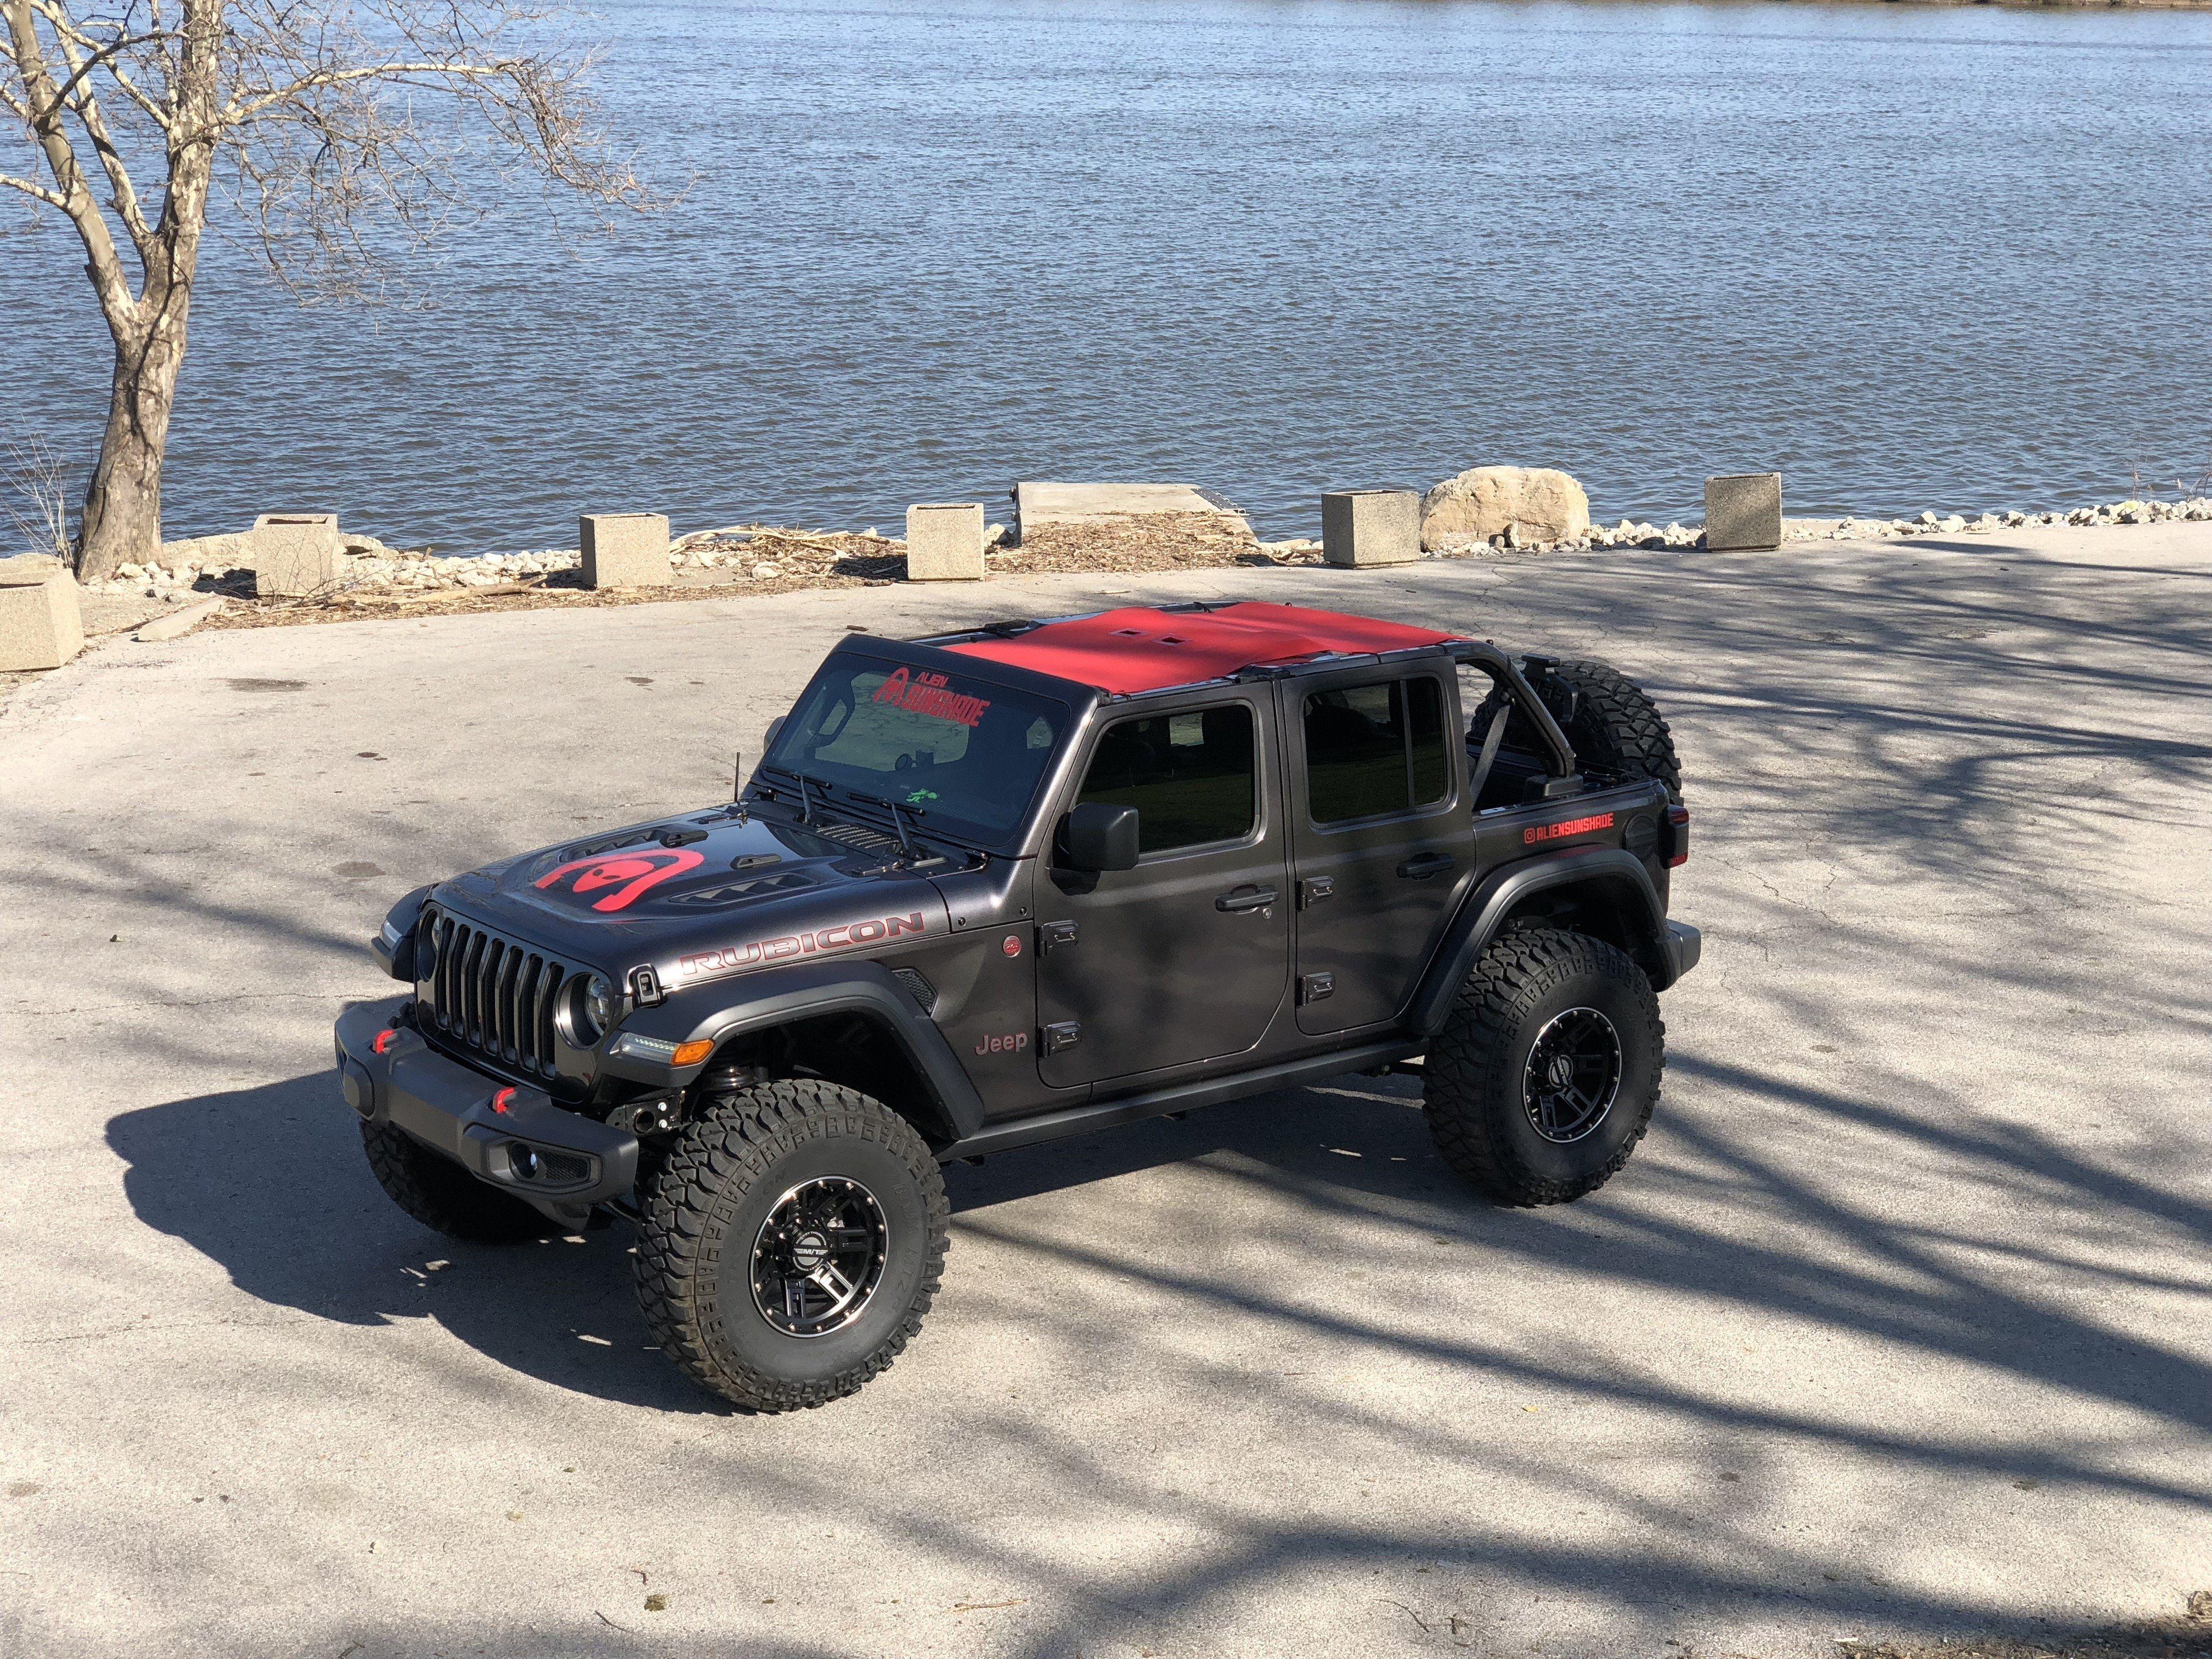 Alien Sunshade Jeep Wrangler Jlu Full Length Sun Shade Mesh Top For 4 Door Unlimited 2018 New Body Style Jeep Wrangler Interior Jeep Wrangler Jeep